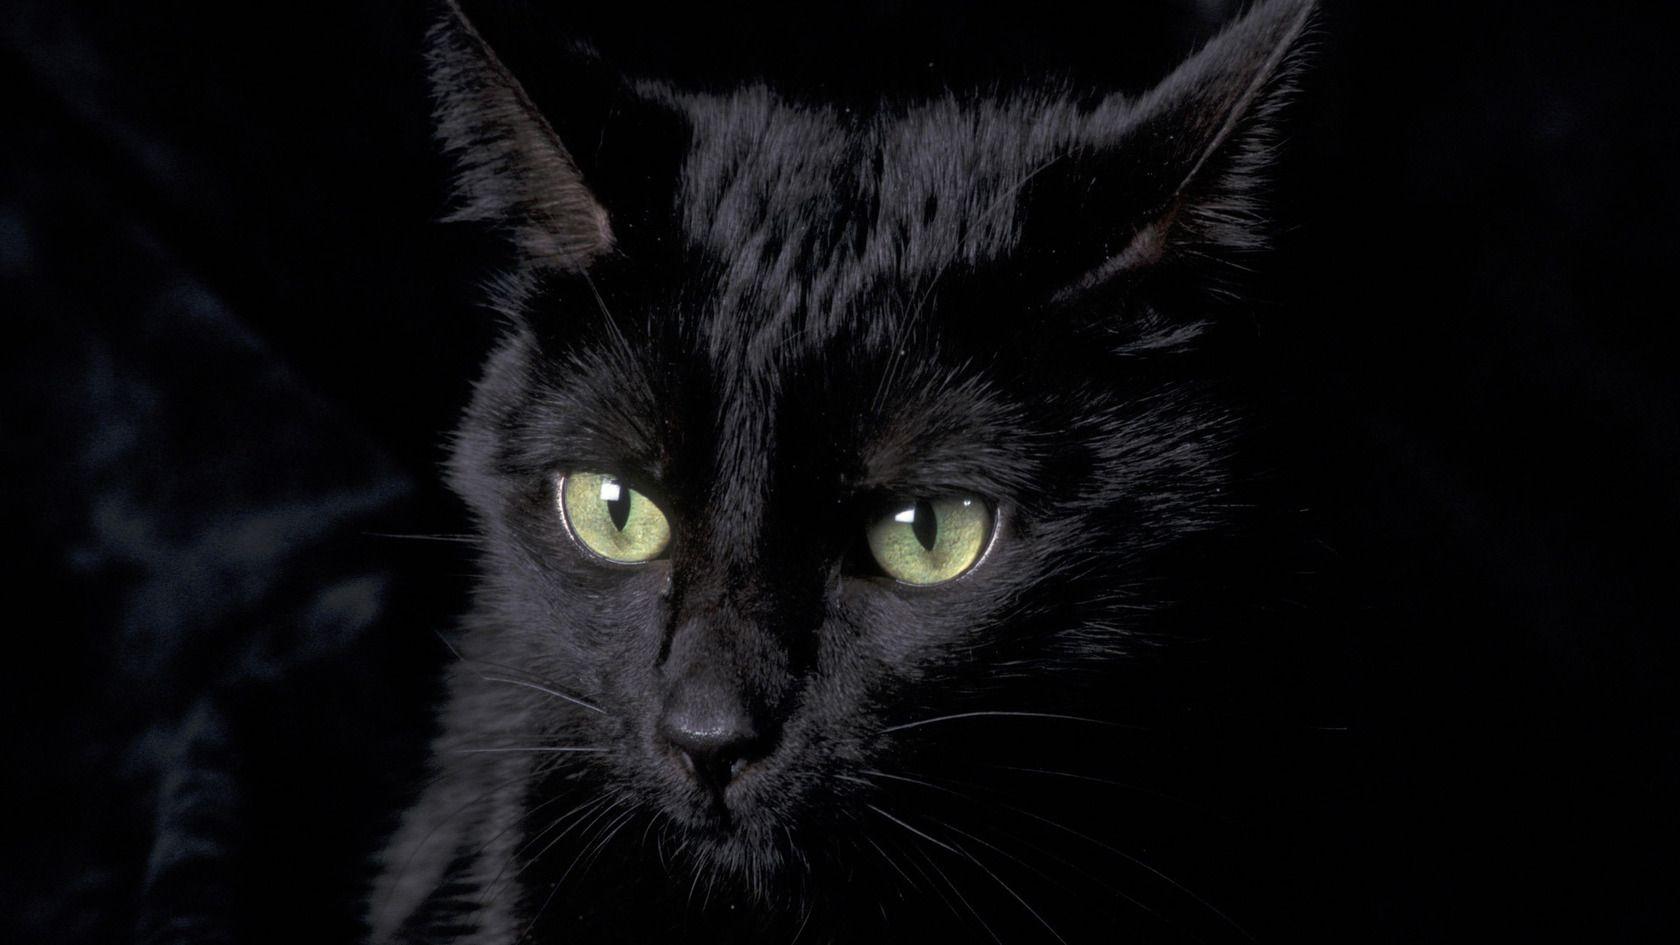 Black Cat Wallpaper HD Images 1106 Wallpaper animaljetz